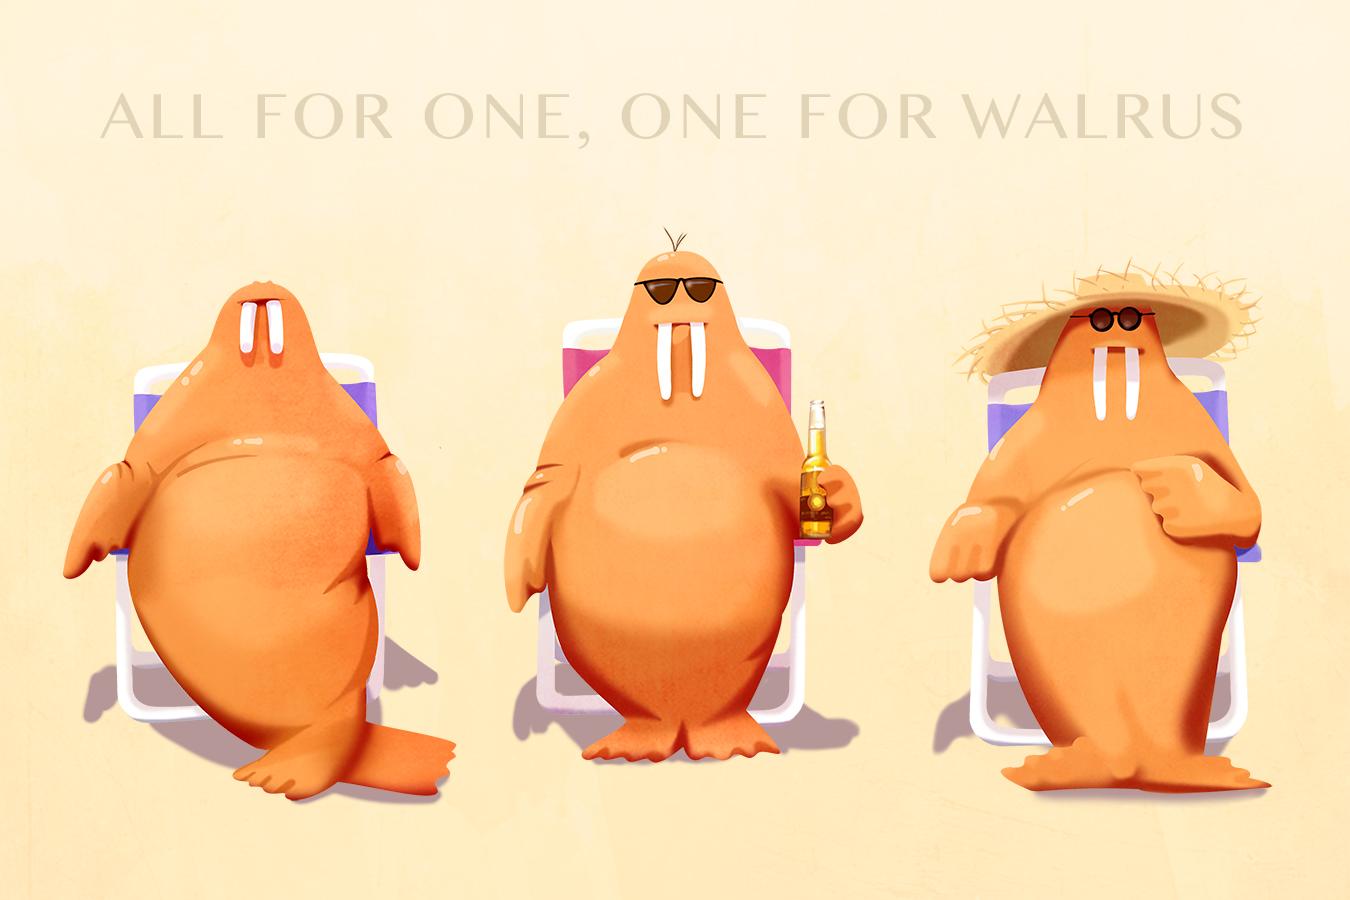 walrus vacation_final.jpg